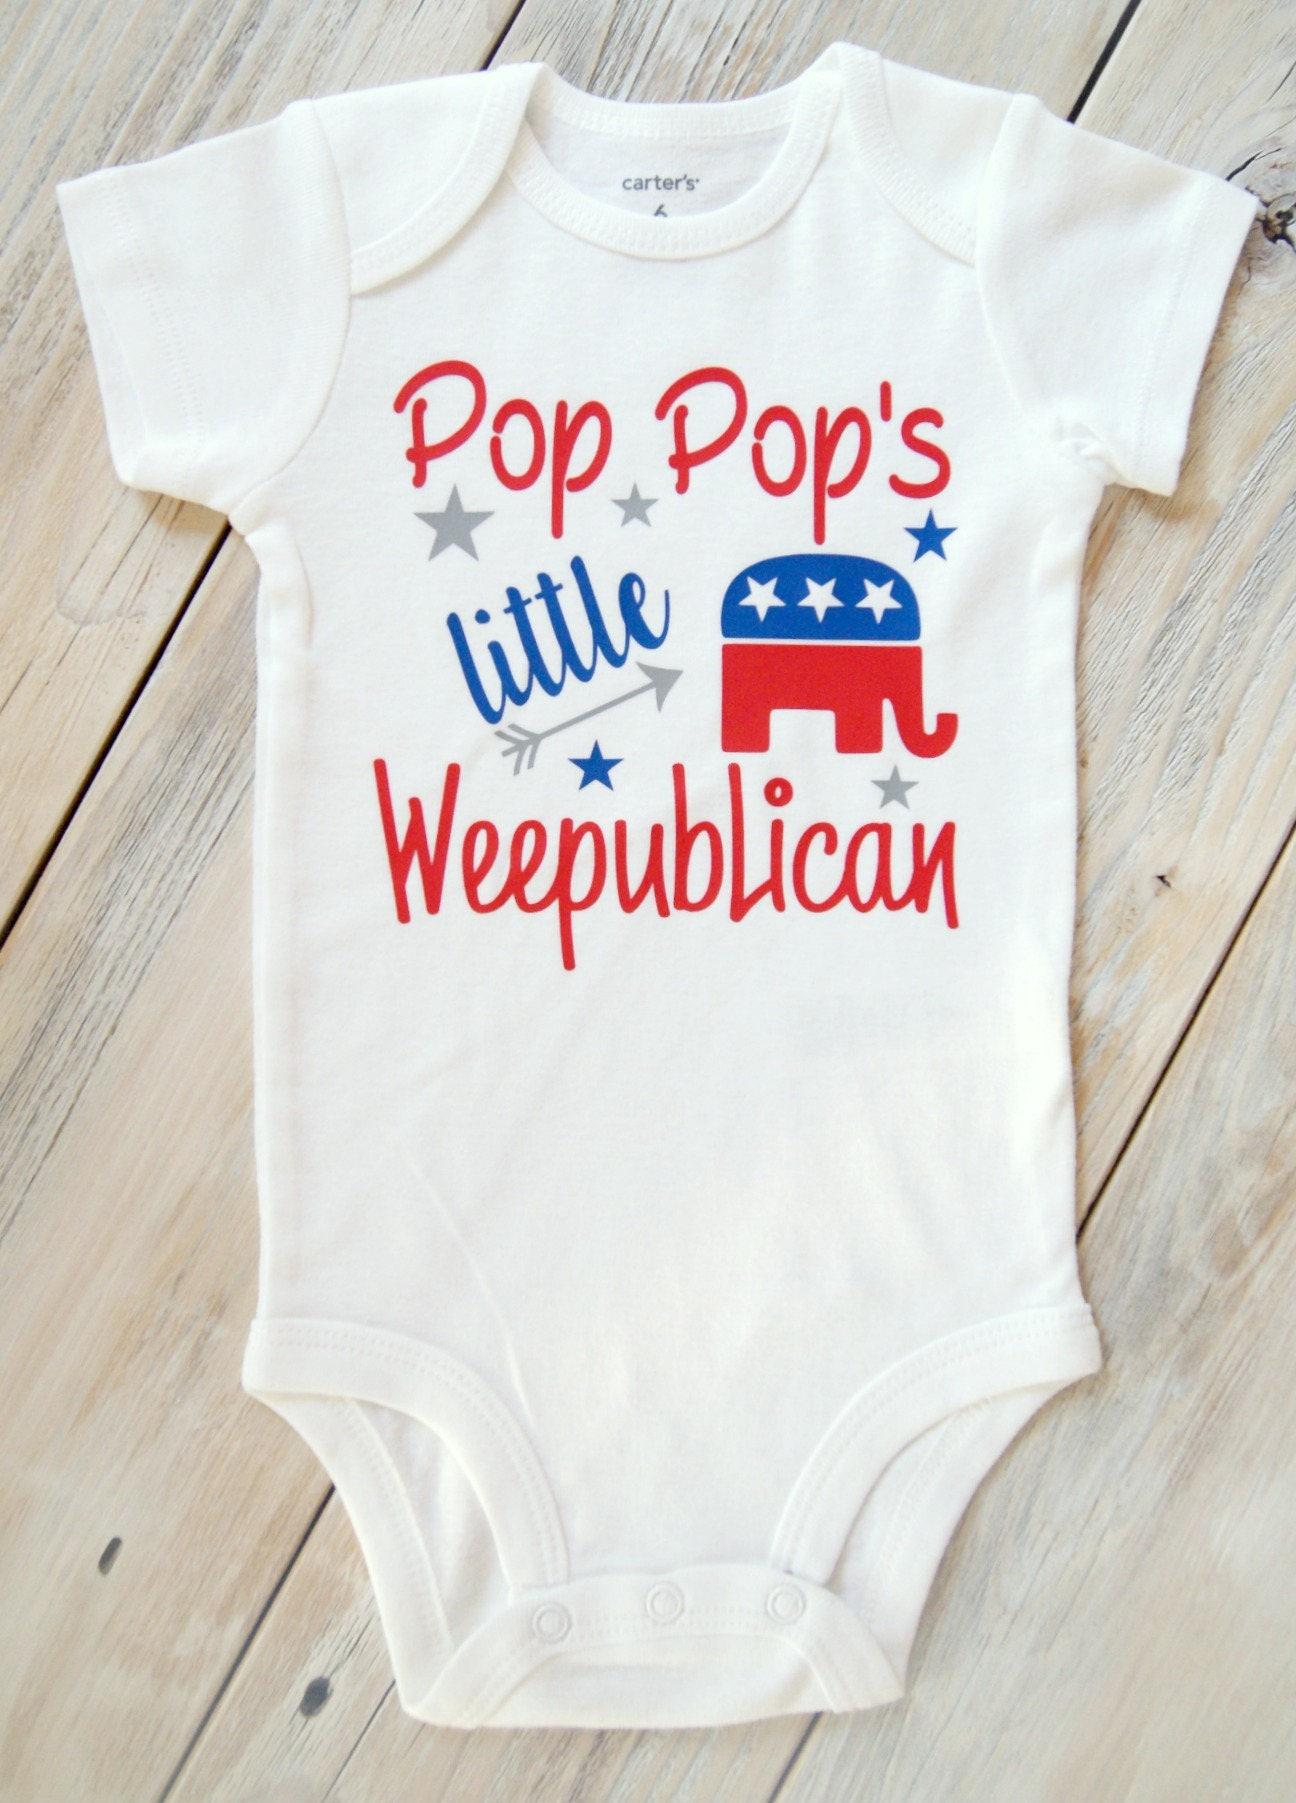 Pop Pop s little Weepublican Baby Girl or Boy esie America